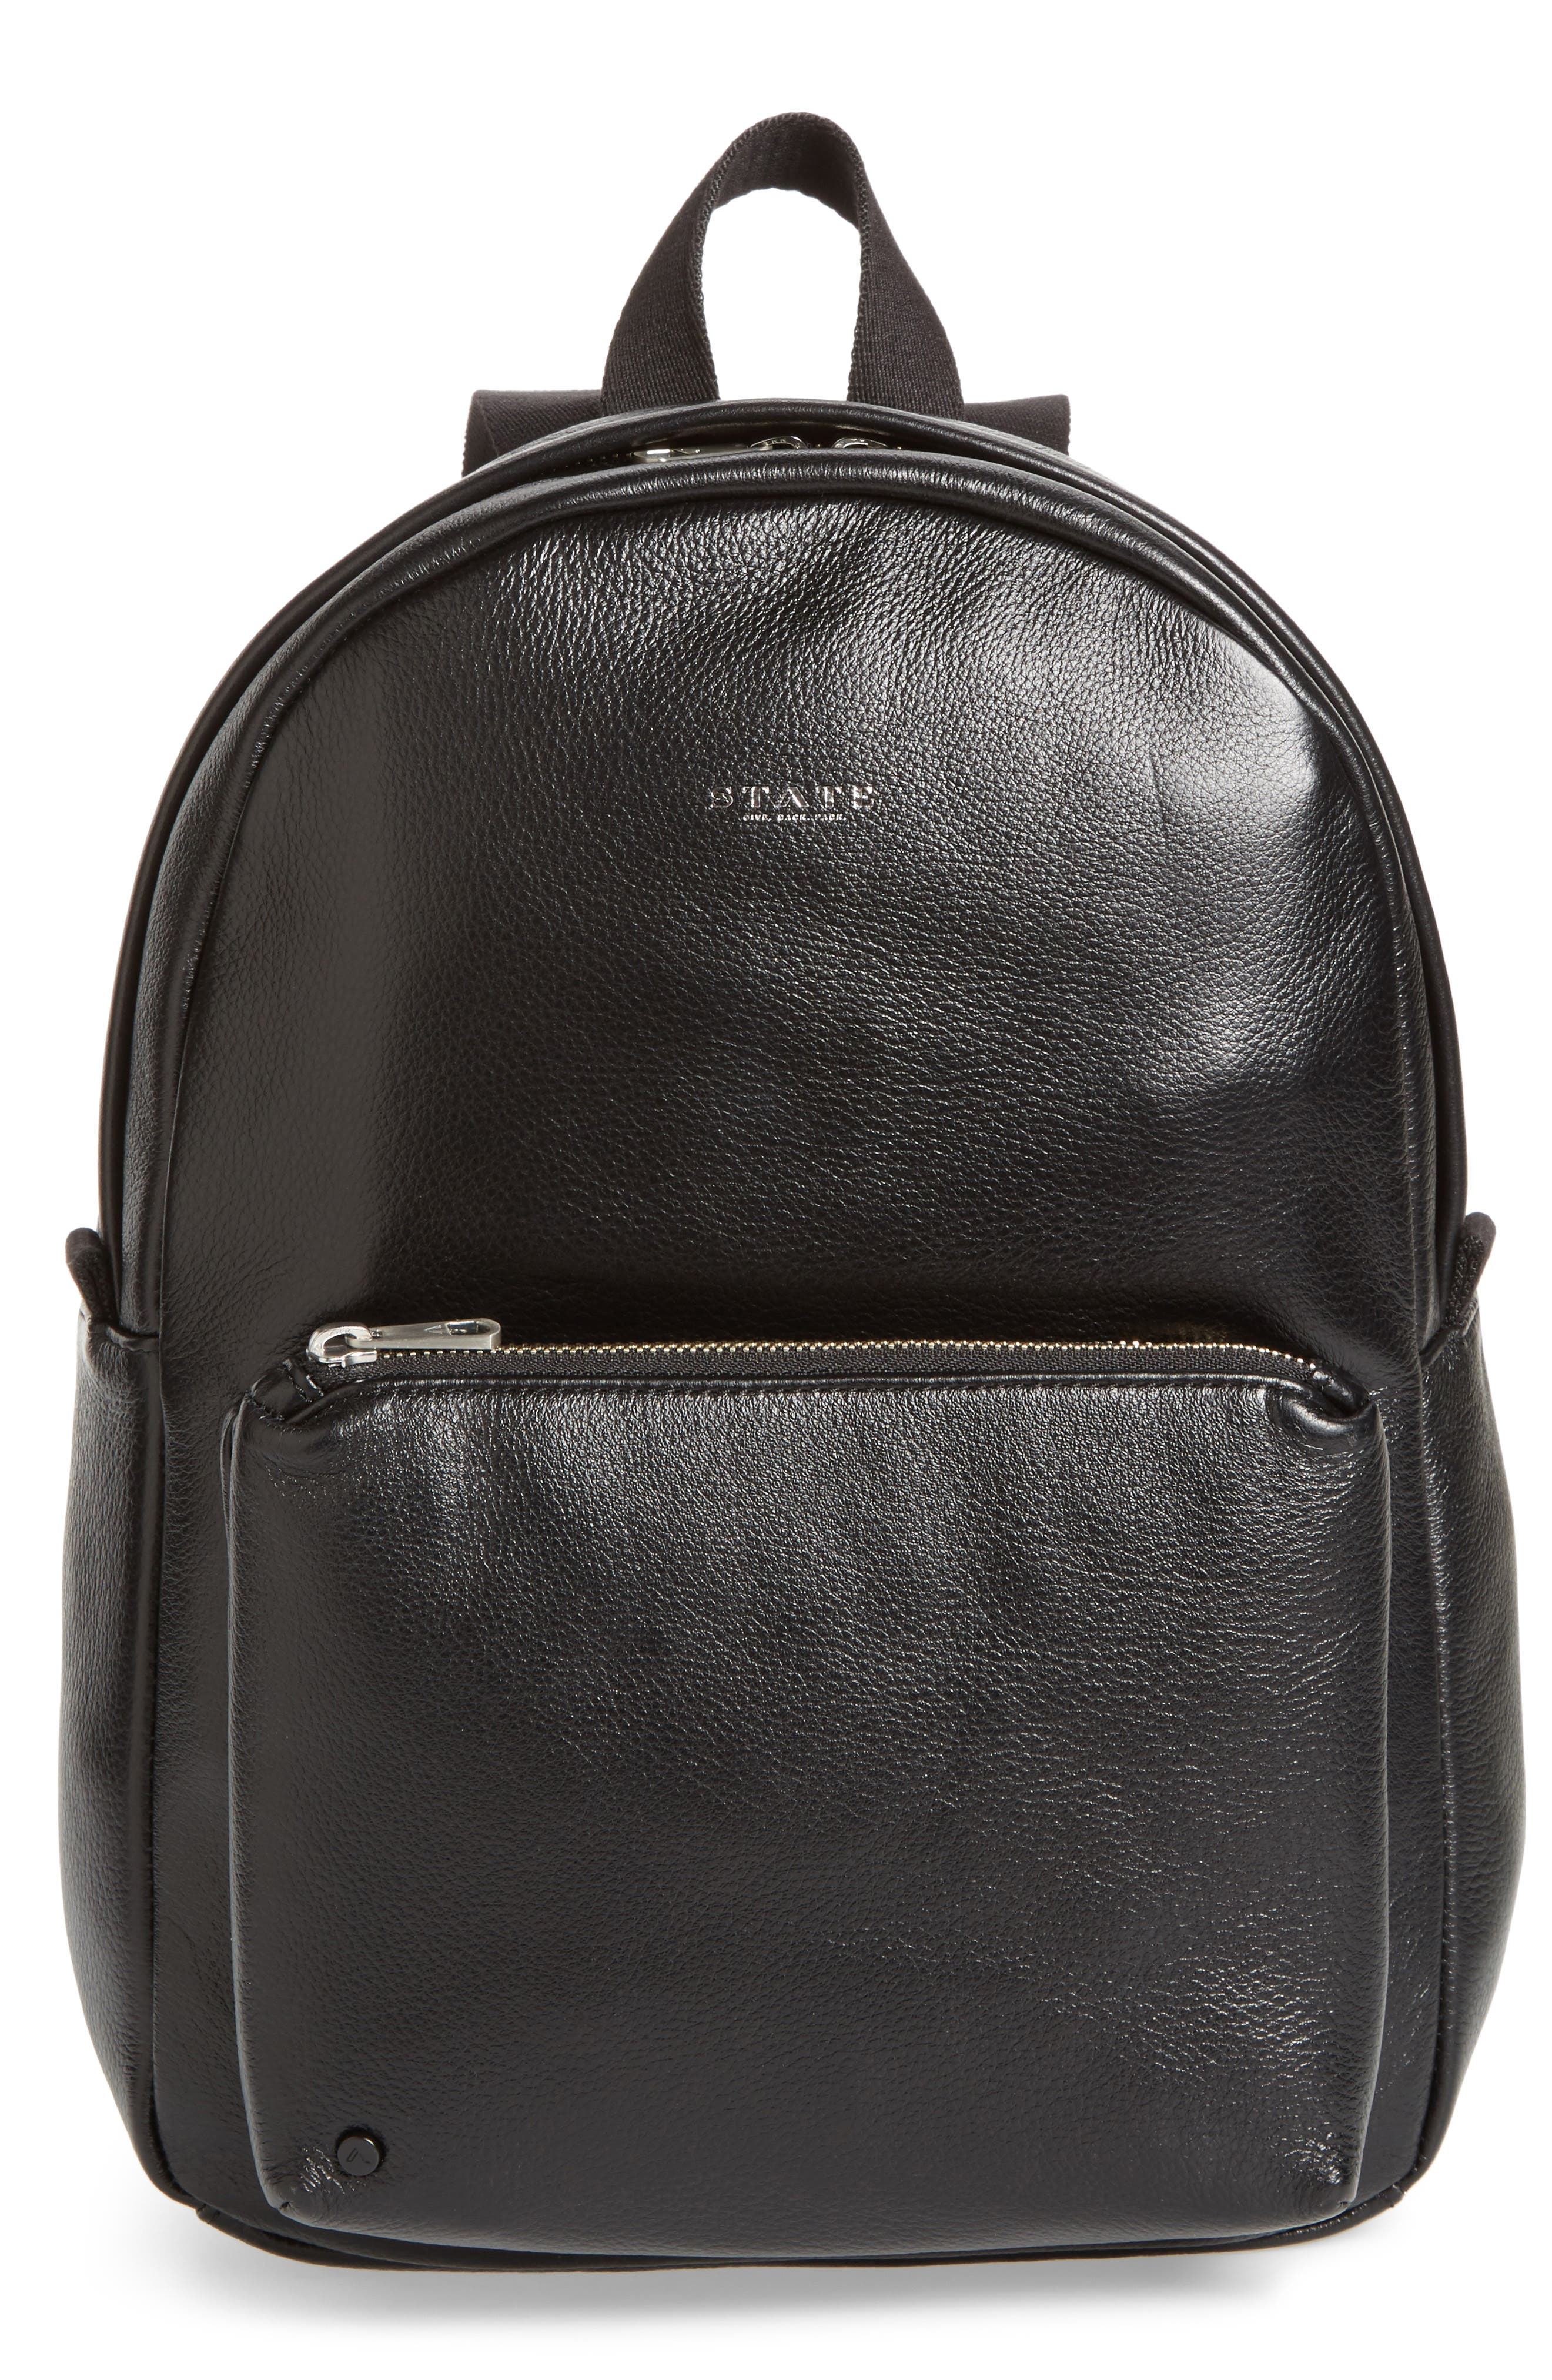 Alternate Image 1 Selected - STATE Bags Greenwood Mini Lorimer Leather Backpack